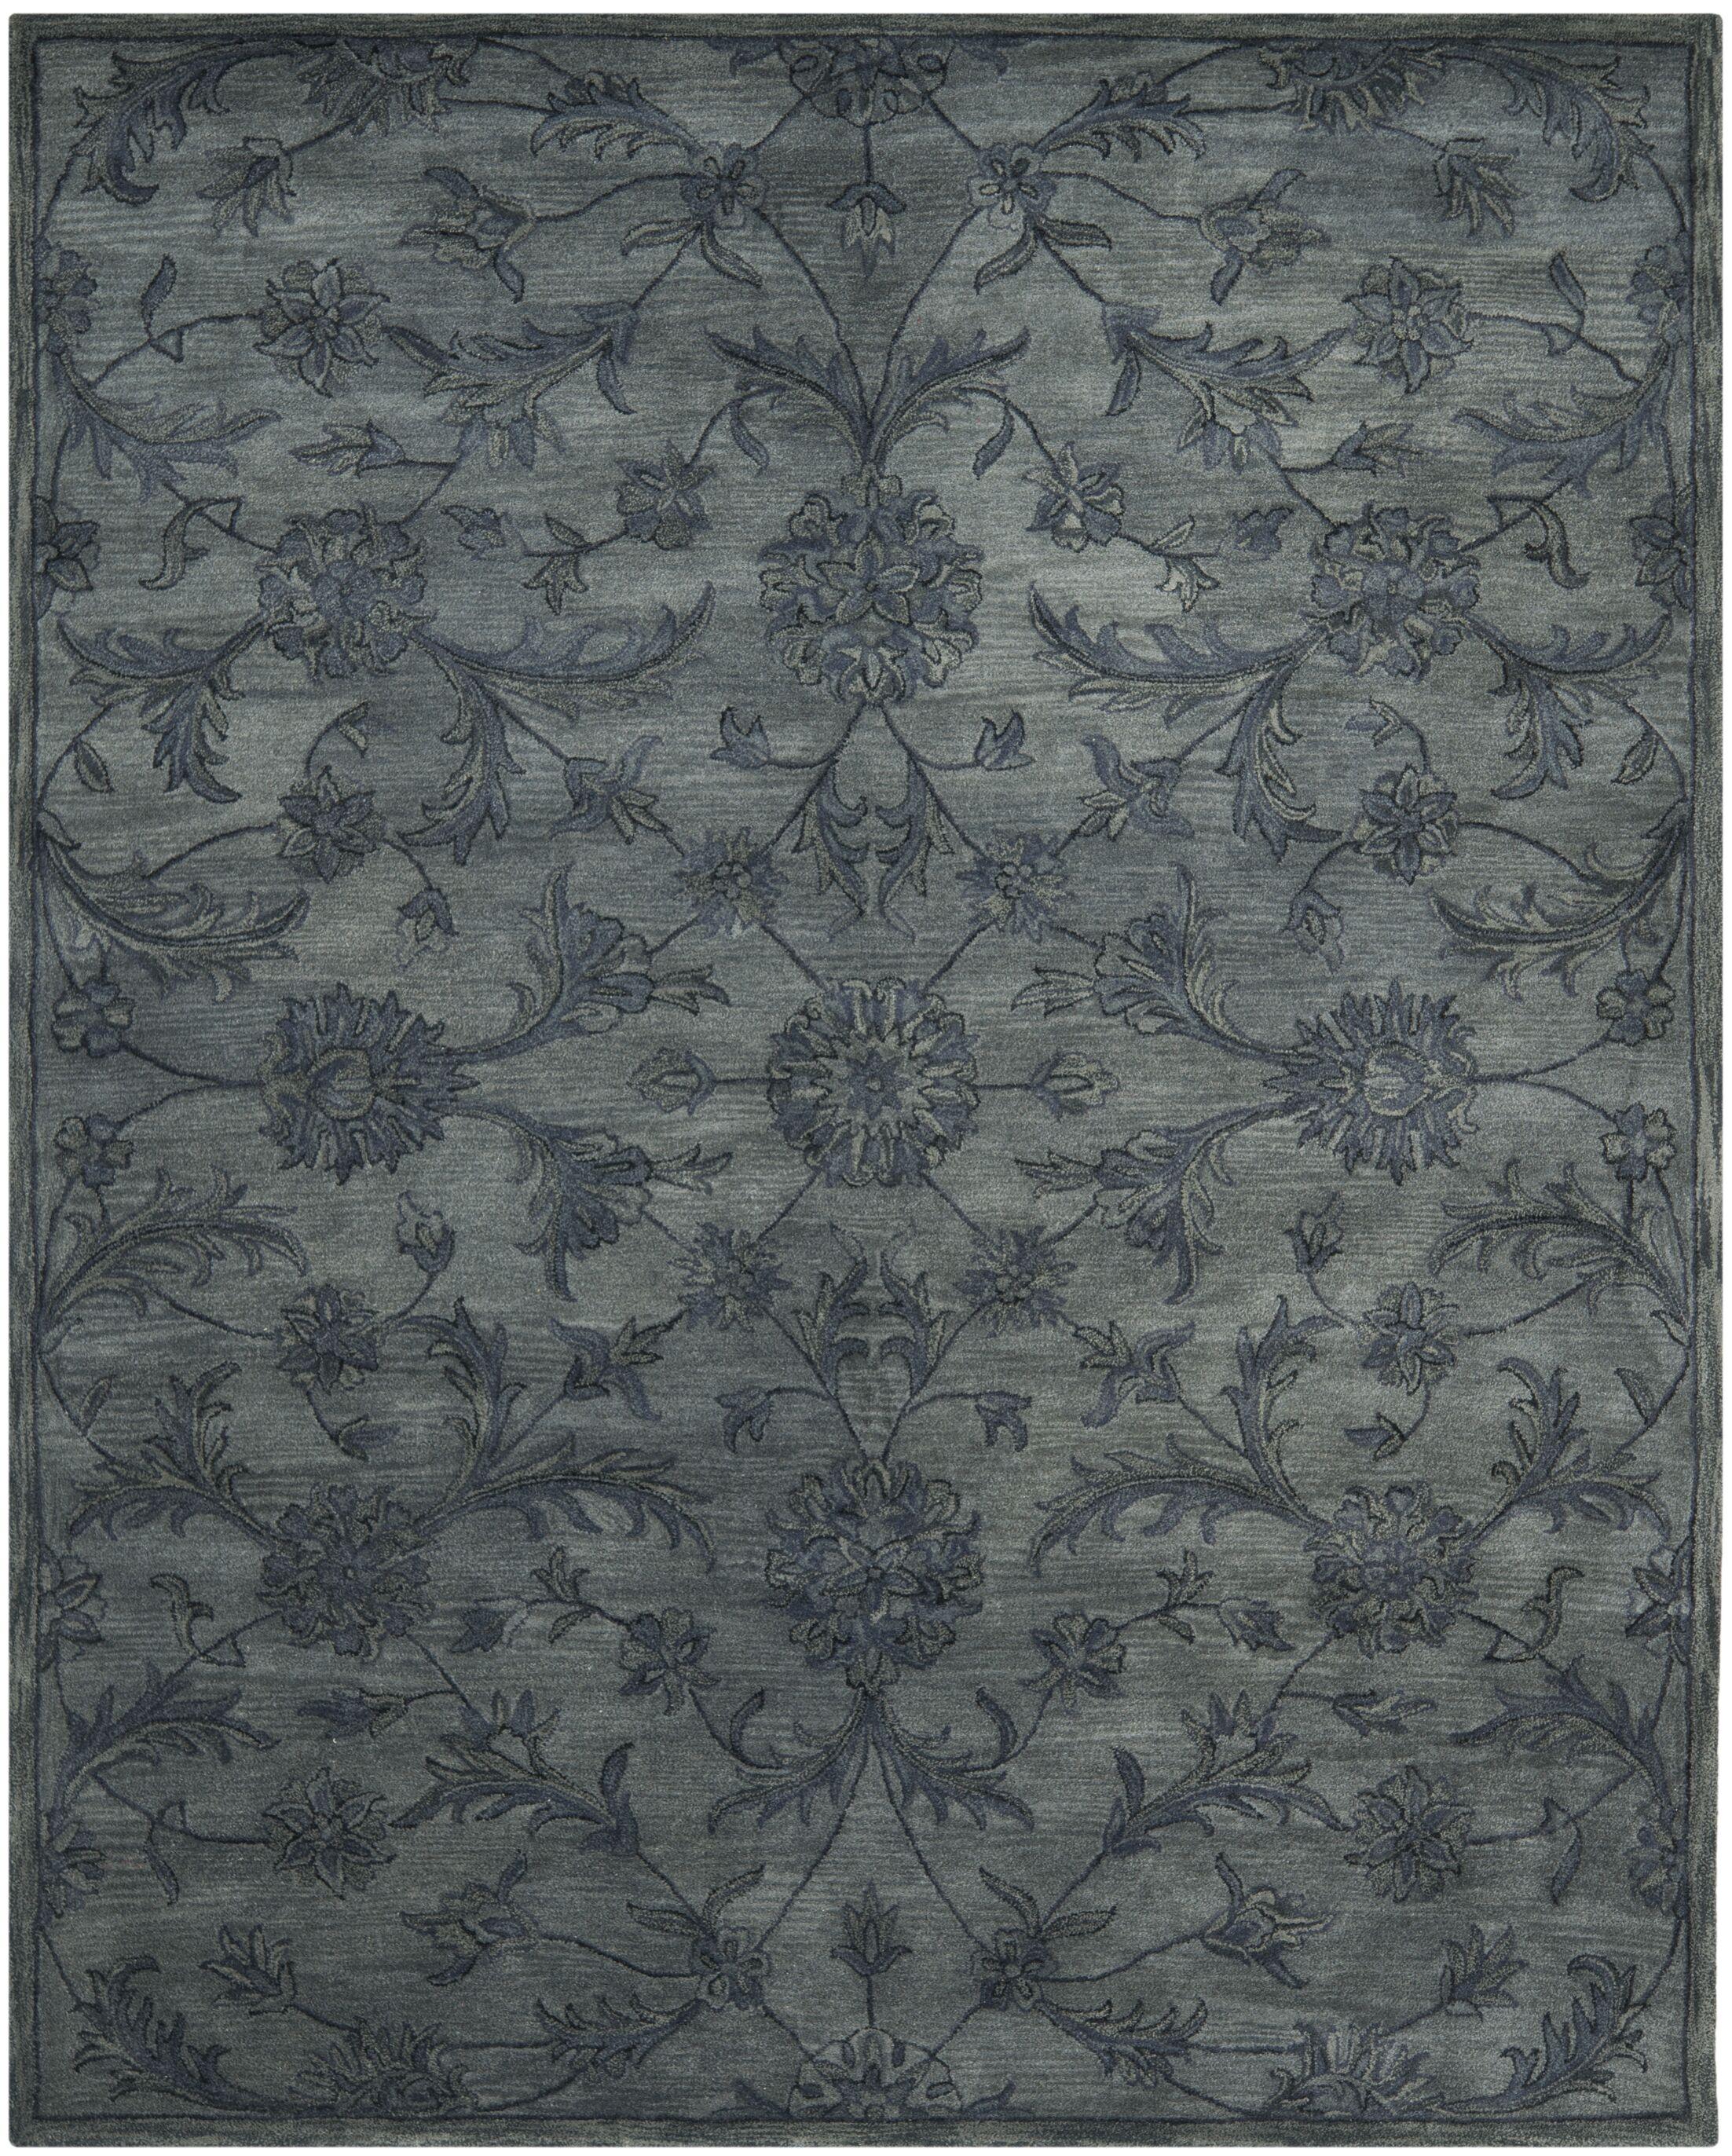 Dunbar Hand-Woven Wool Grey Area Rug Rug Size: Rectangle 9'6